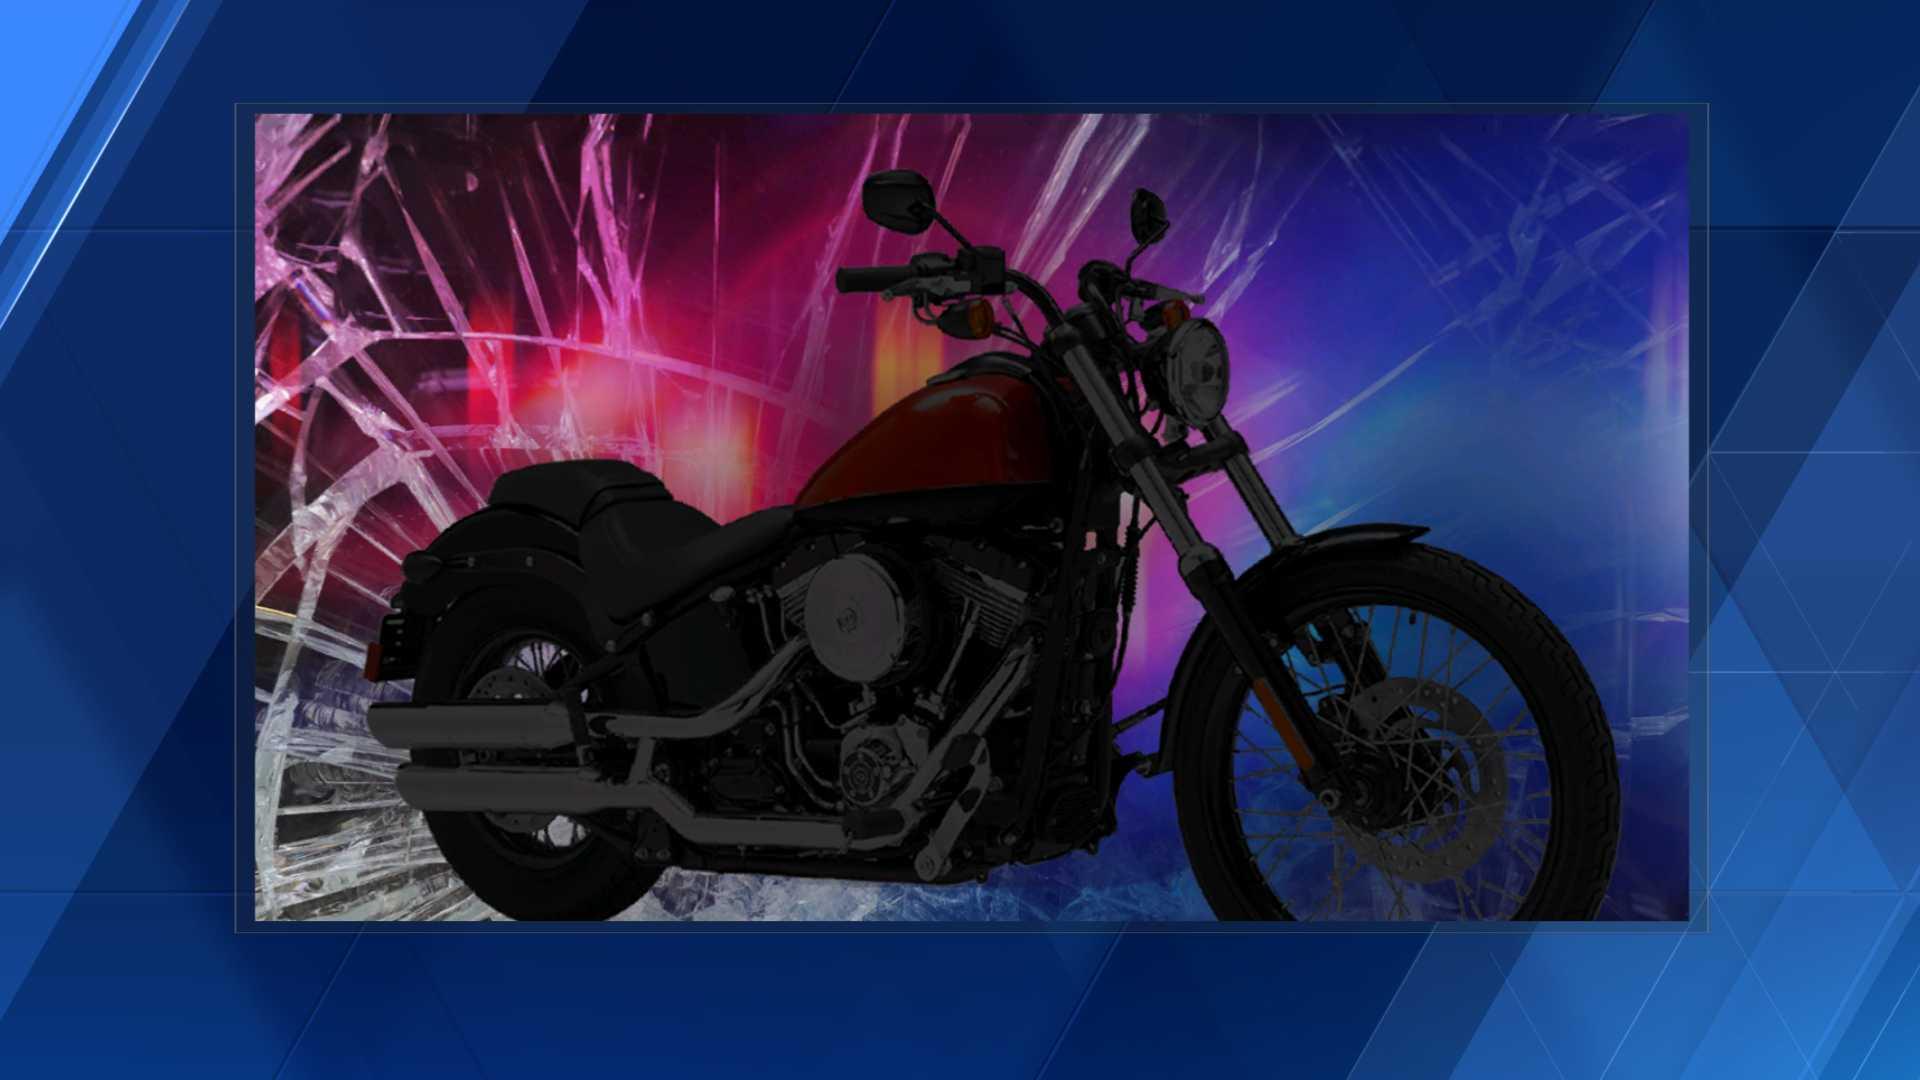 Iowa State Patrol: Nebraska motorcyclist dead after colliding with semitruck